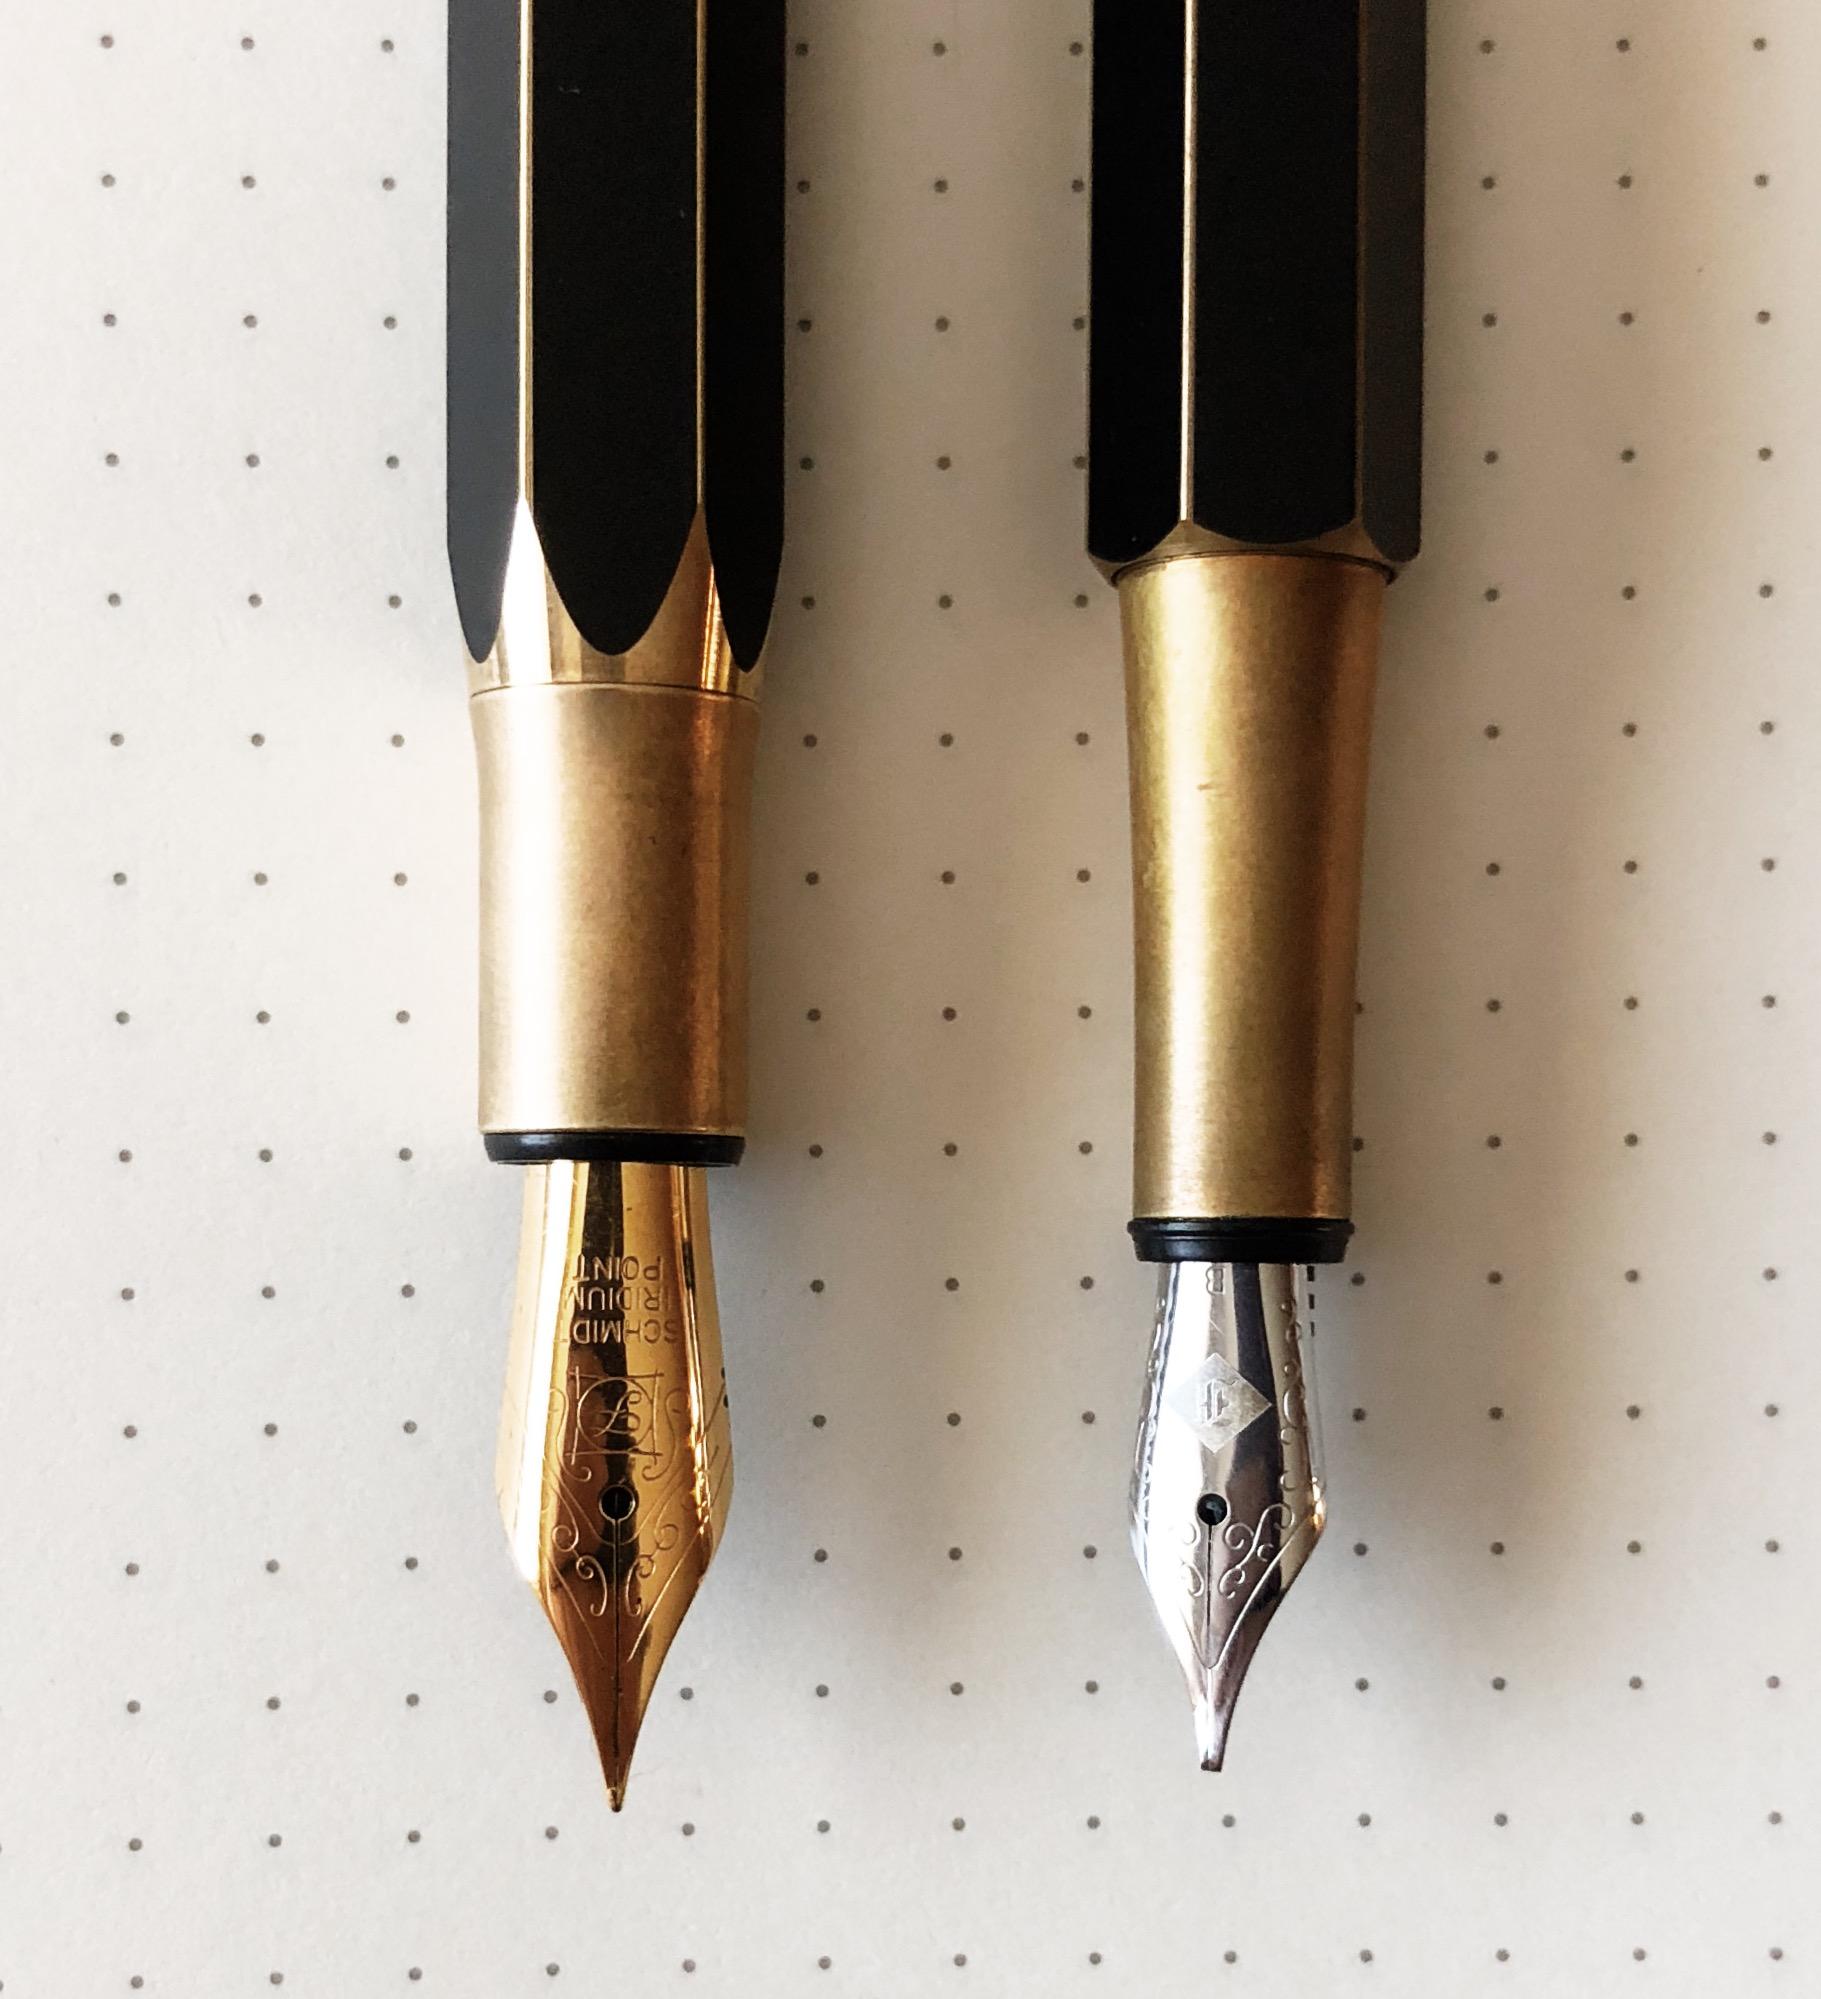 ystudio Brassing Desk Fountain Pen nib